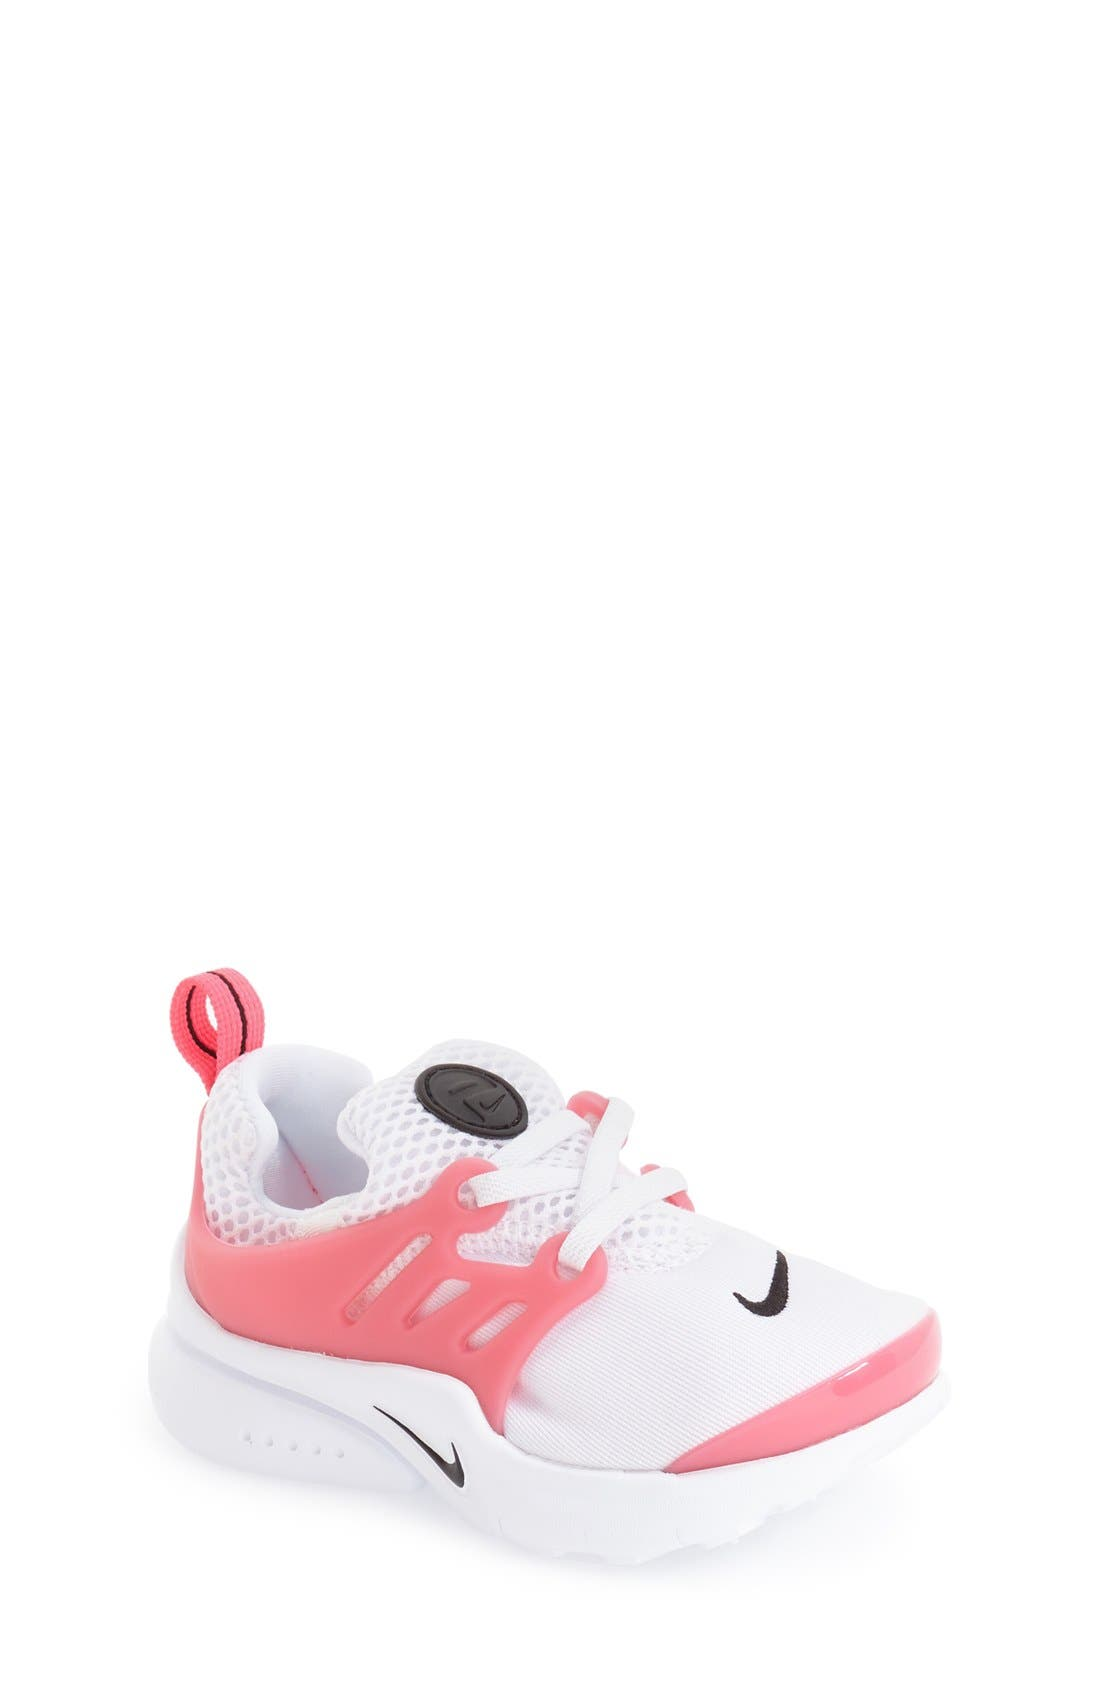 NIKE 'Little Presto' Slip-On Sneaker